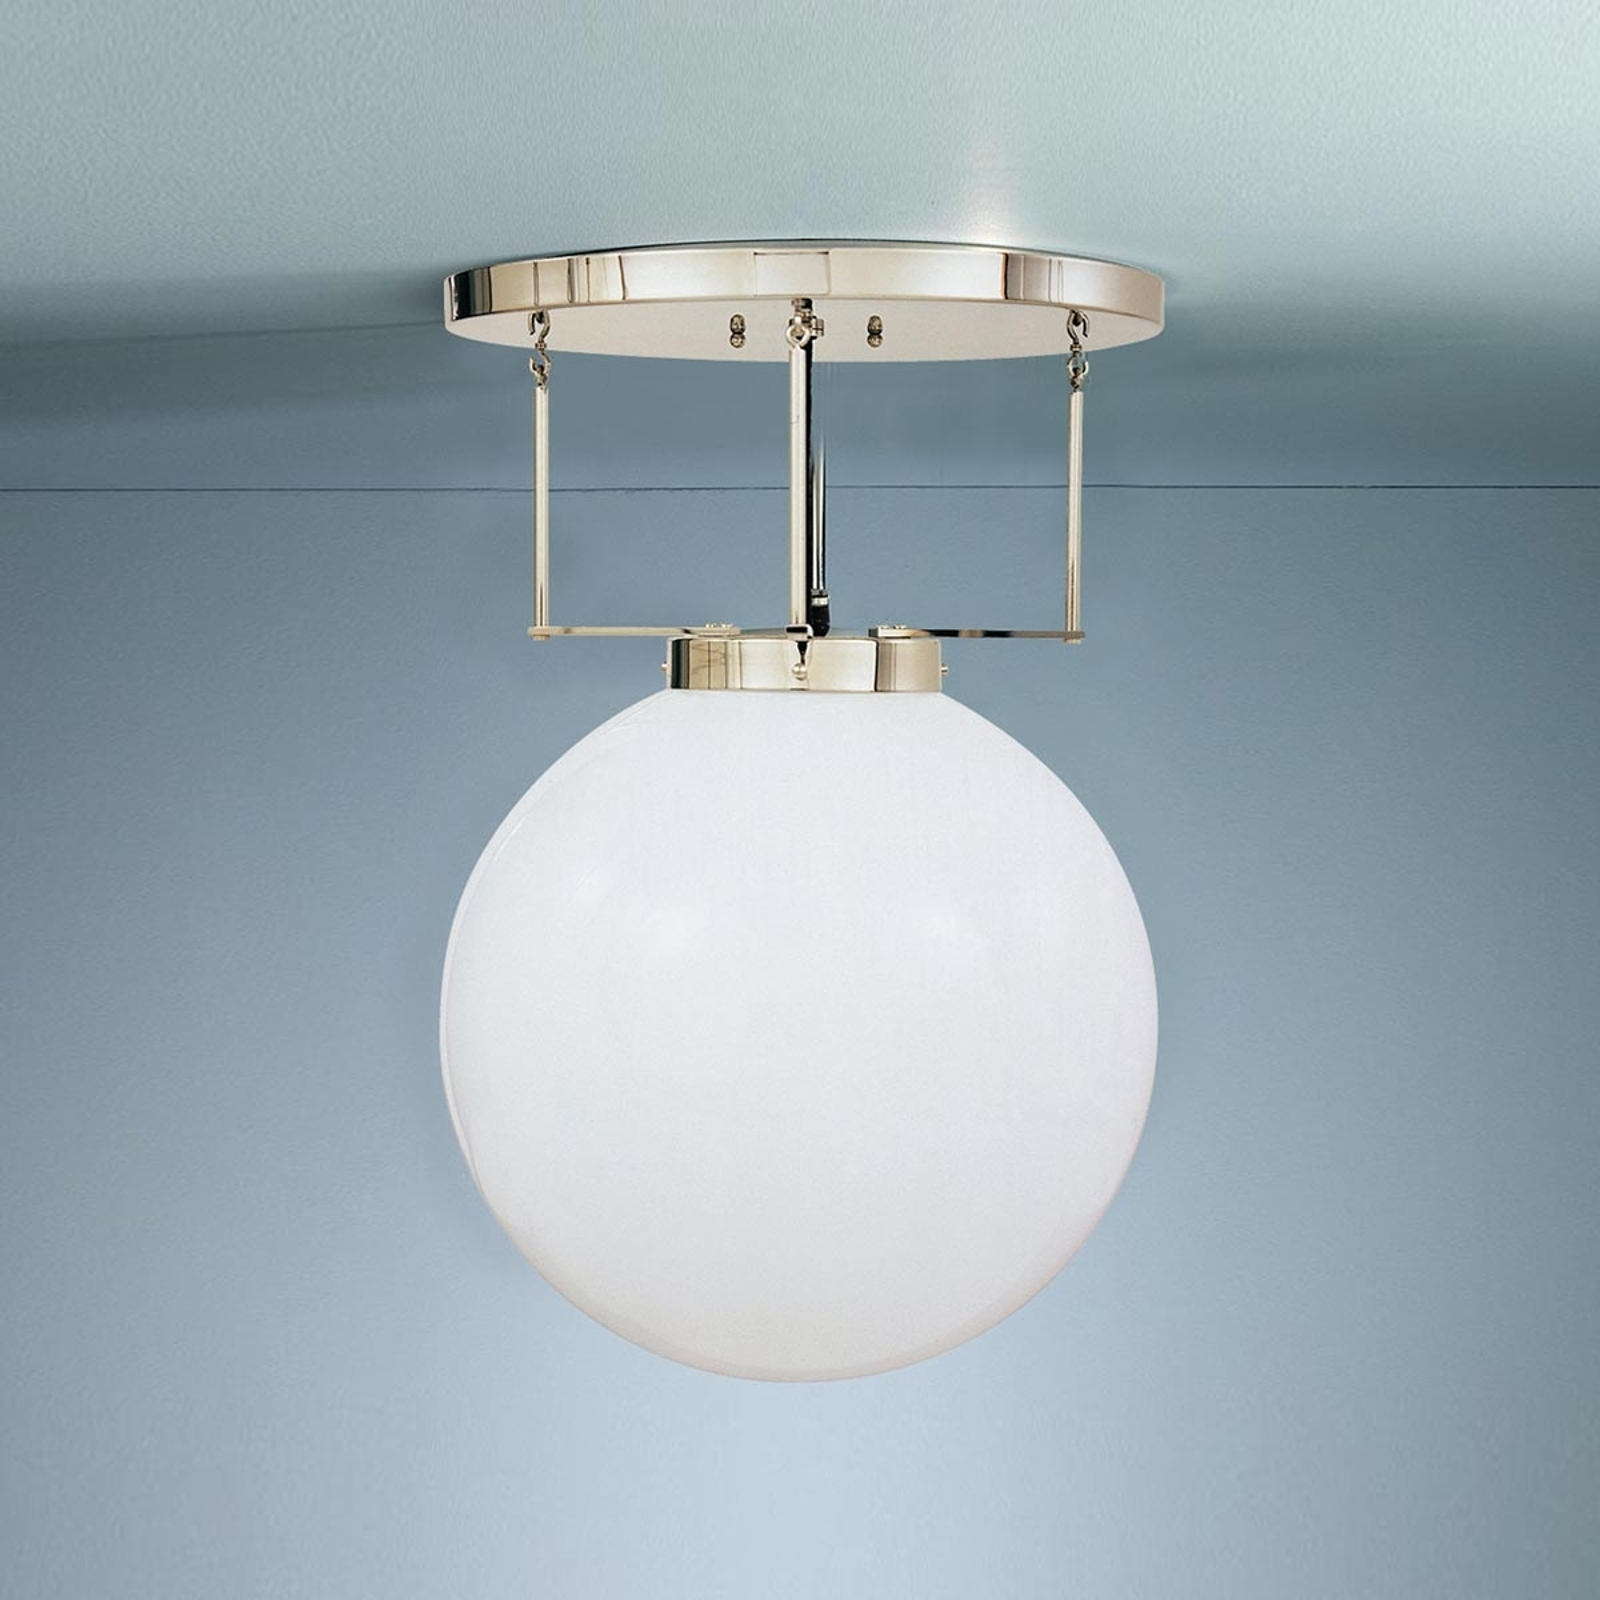 Loftlampe Af Messing I Bauhaus Stil Lampegiganten Dk